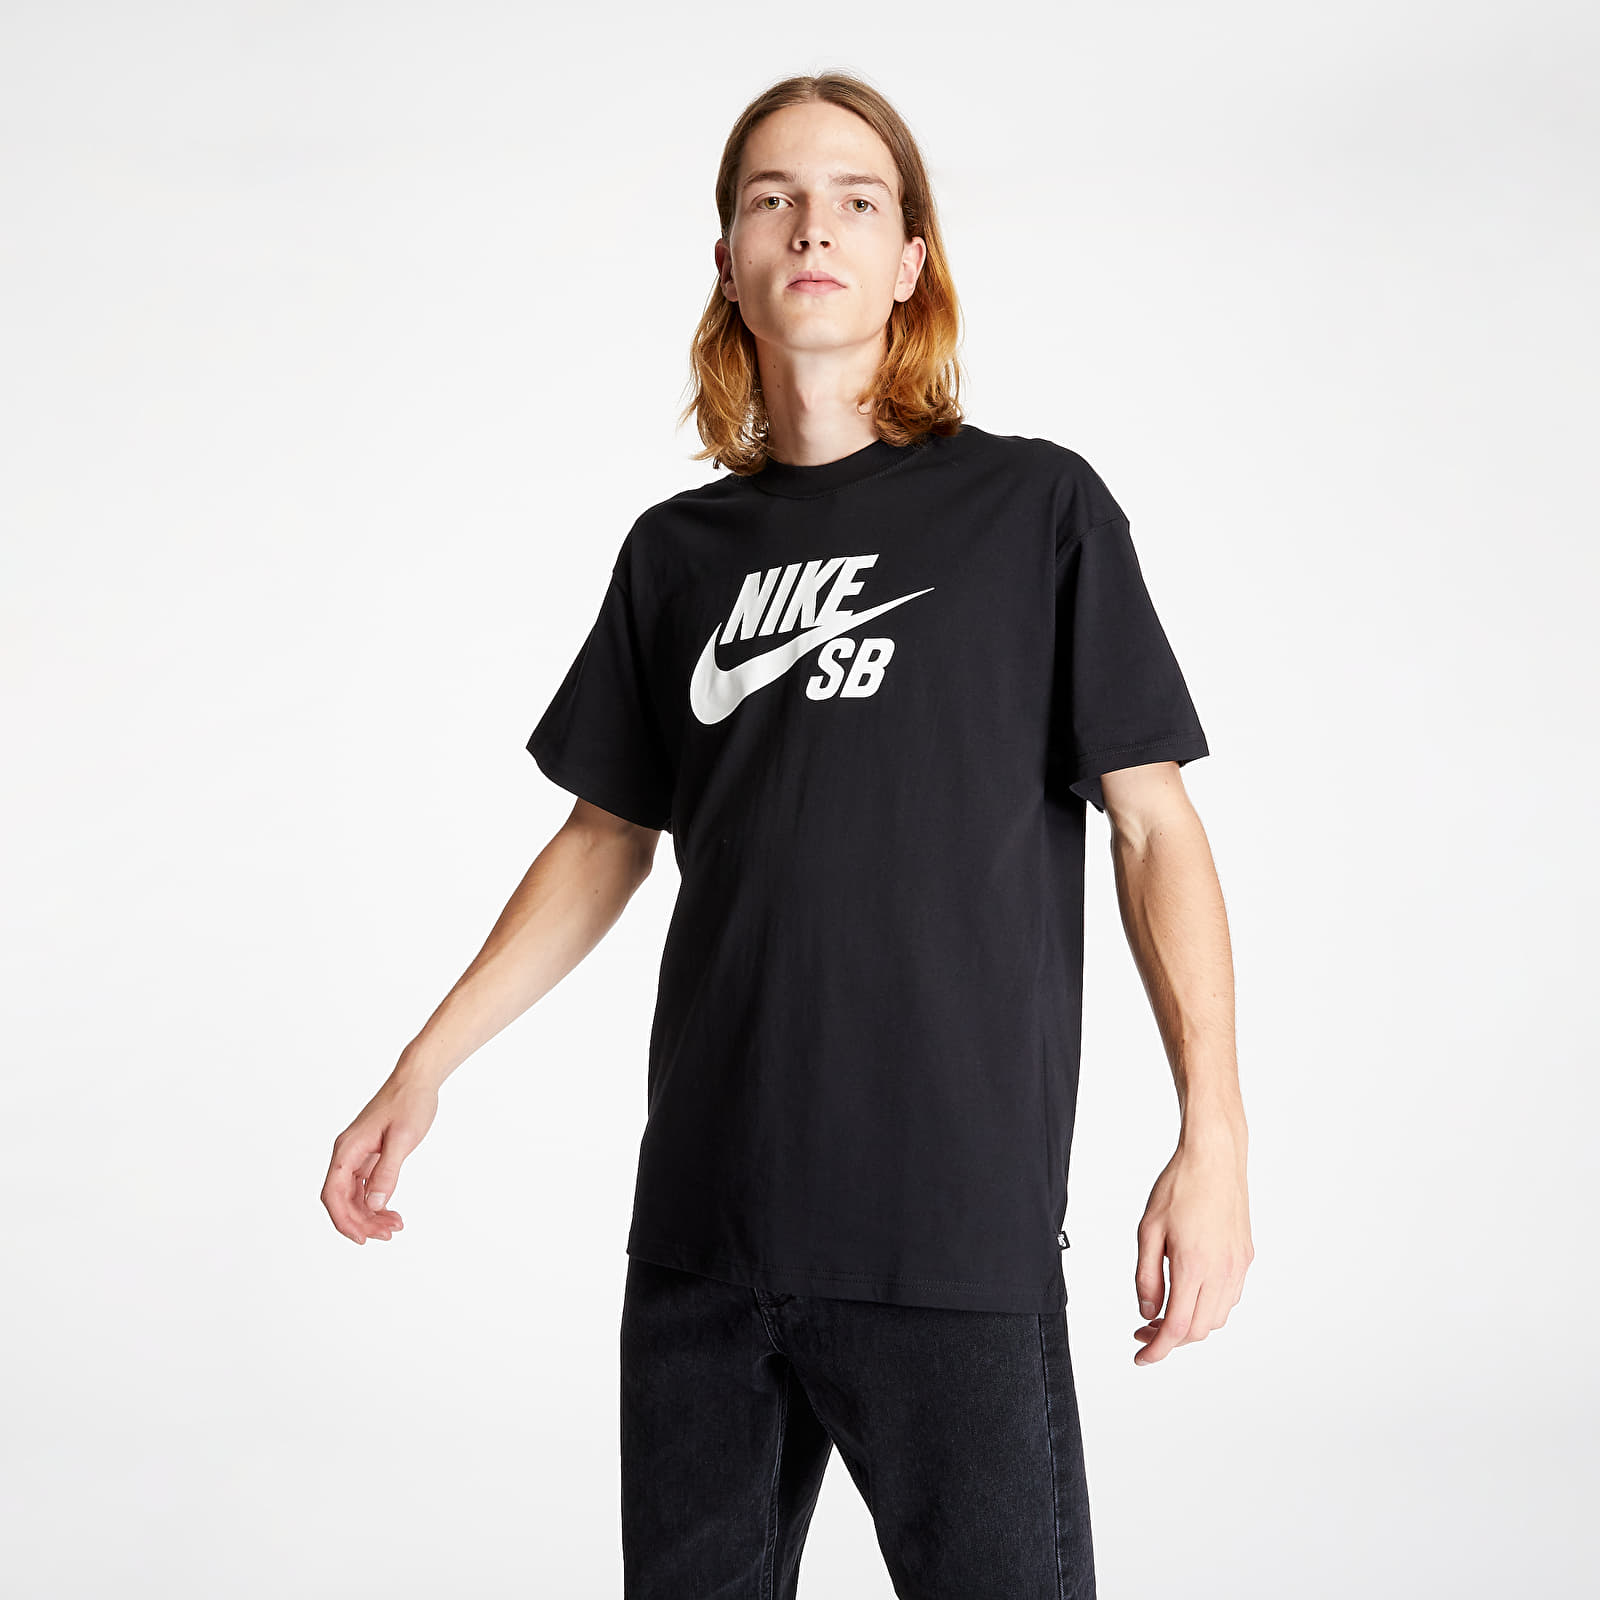 Nike SB Logo Skate Tee Black/ White S